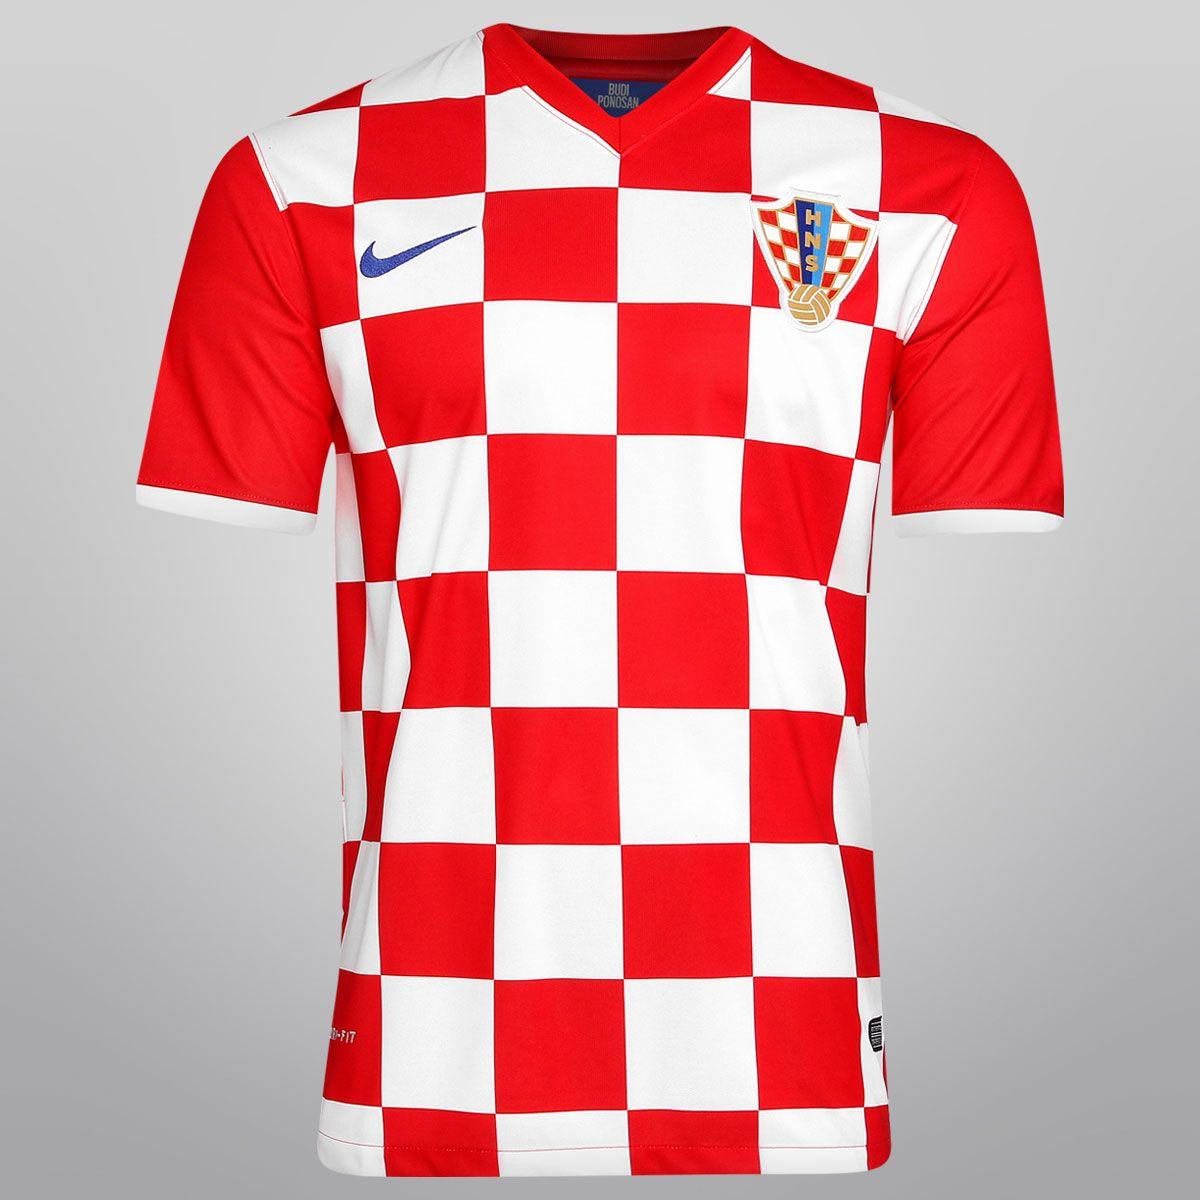 9741387df Netshoes - Camisa Nike Seleção Croácia Home 2014 s nº - Torcedor ...